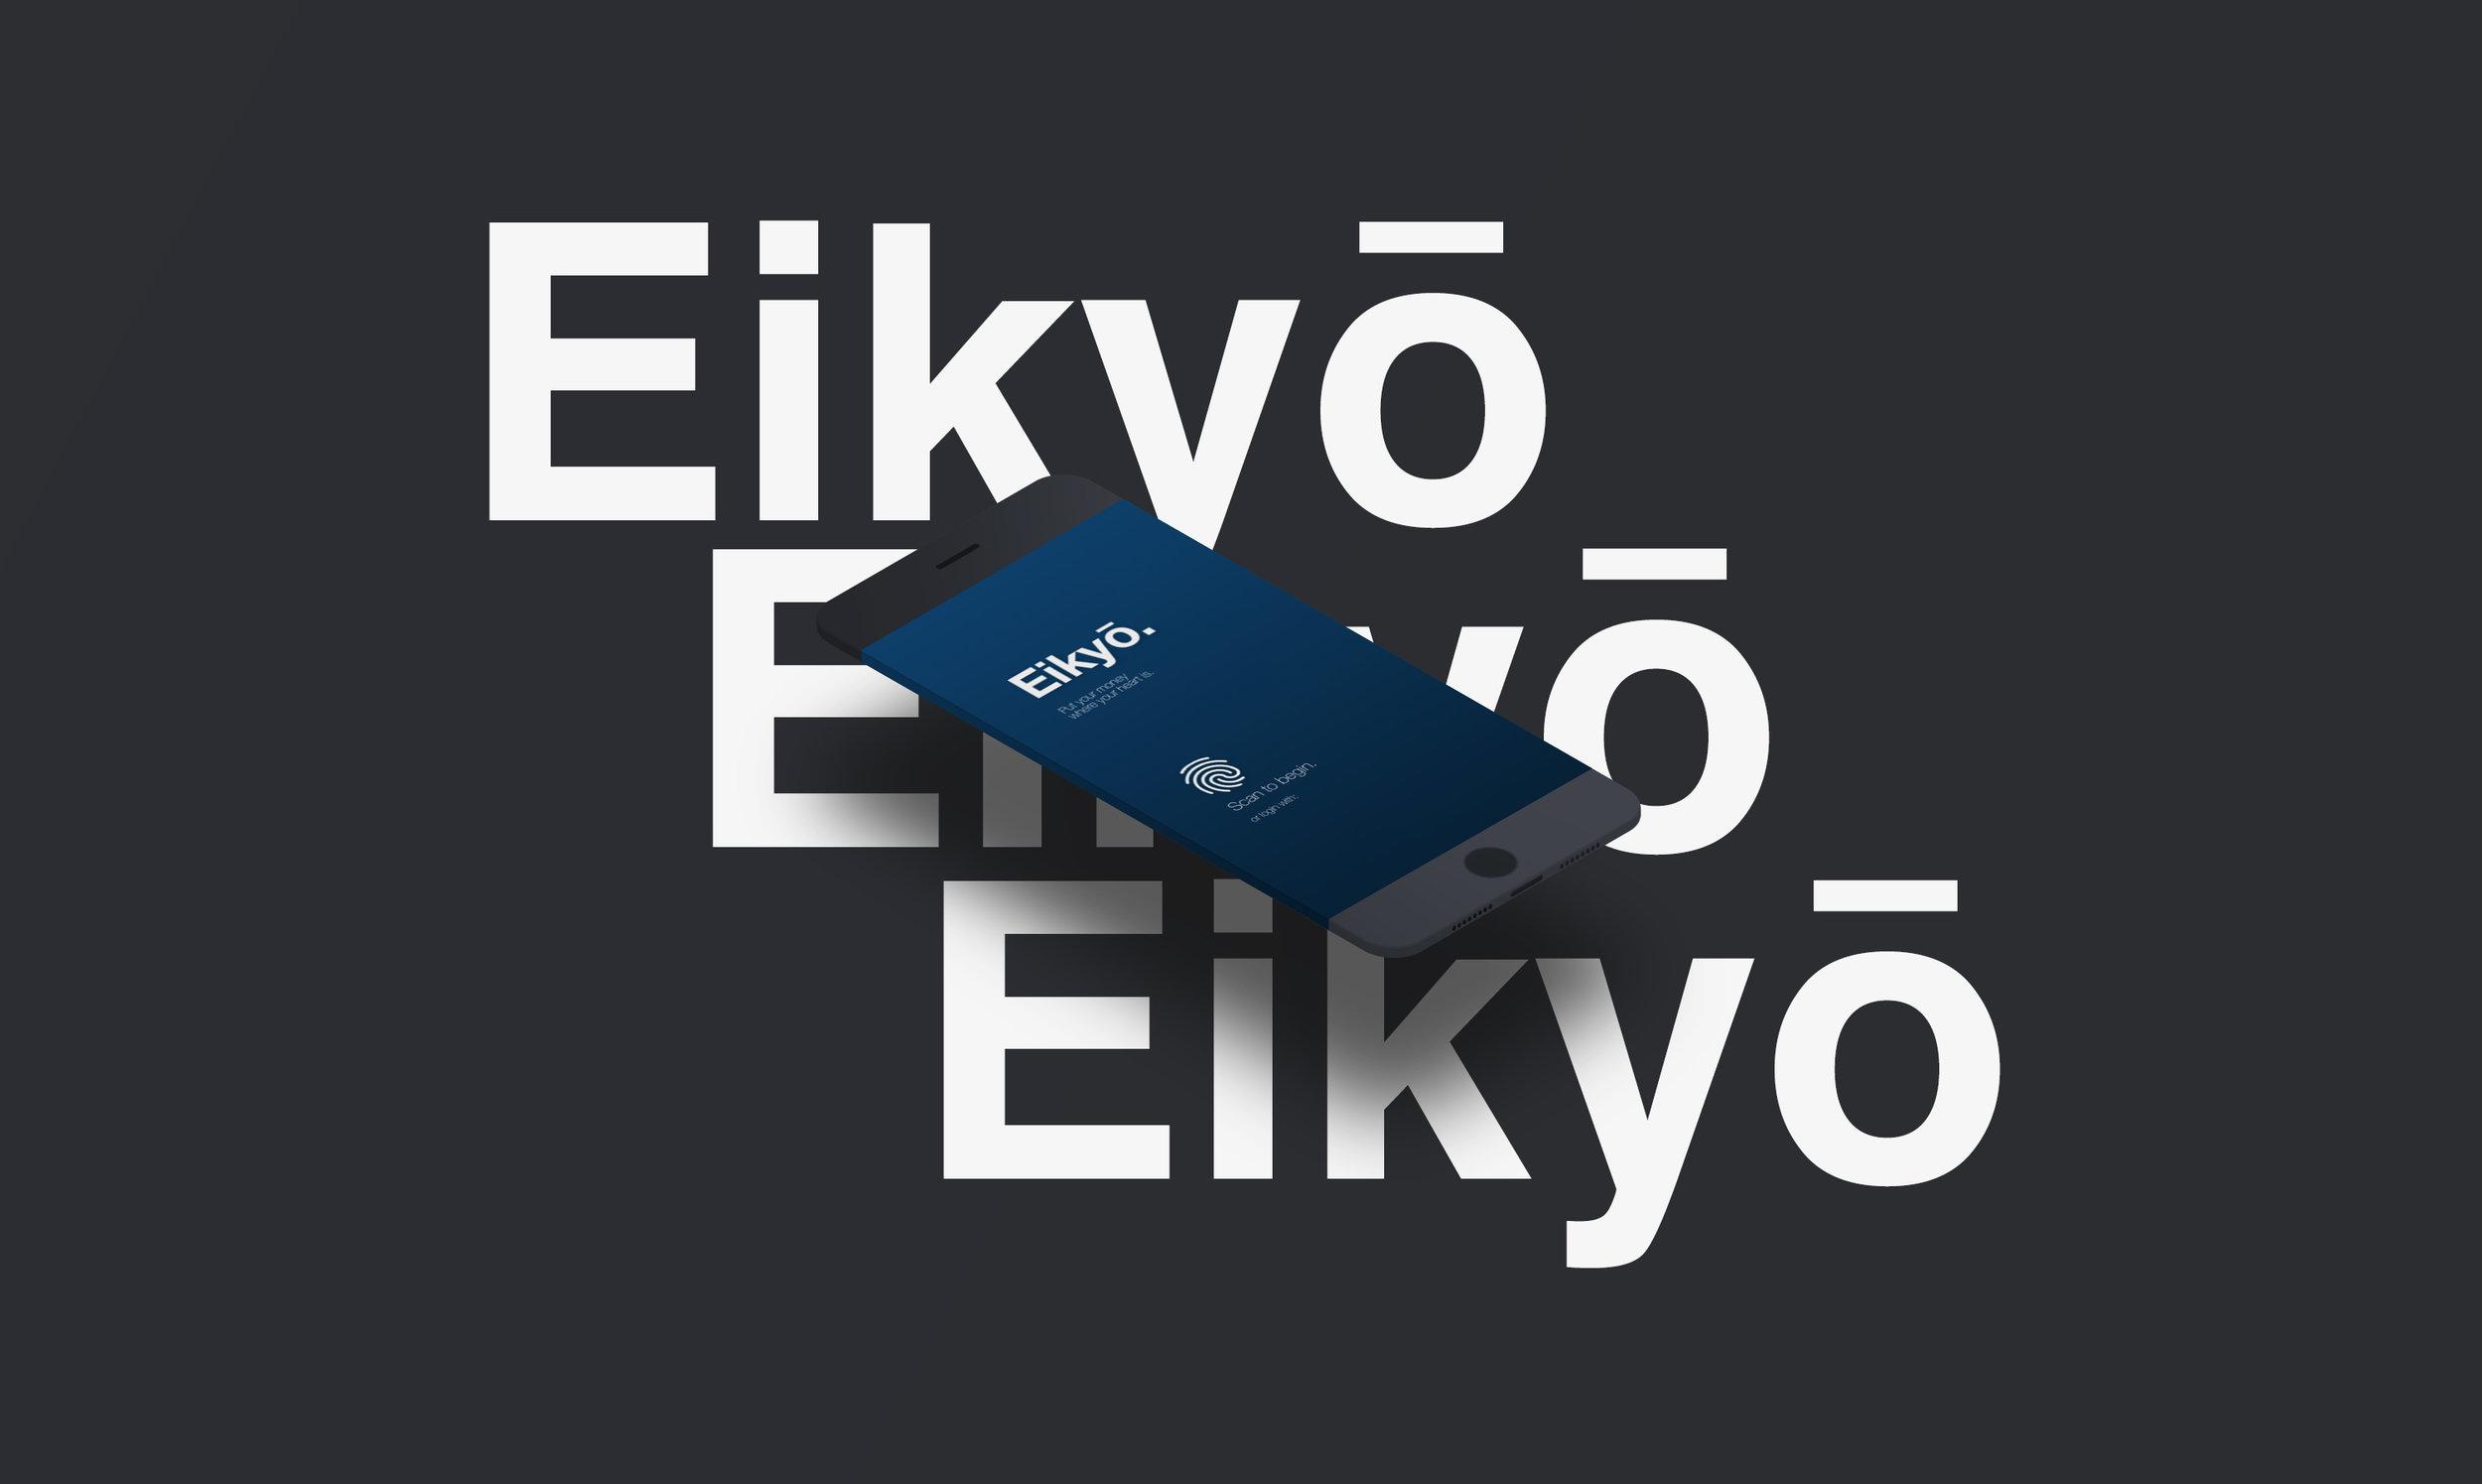 Eikyo Mockup Text.jpg